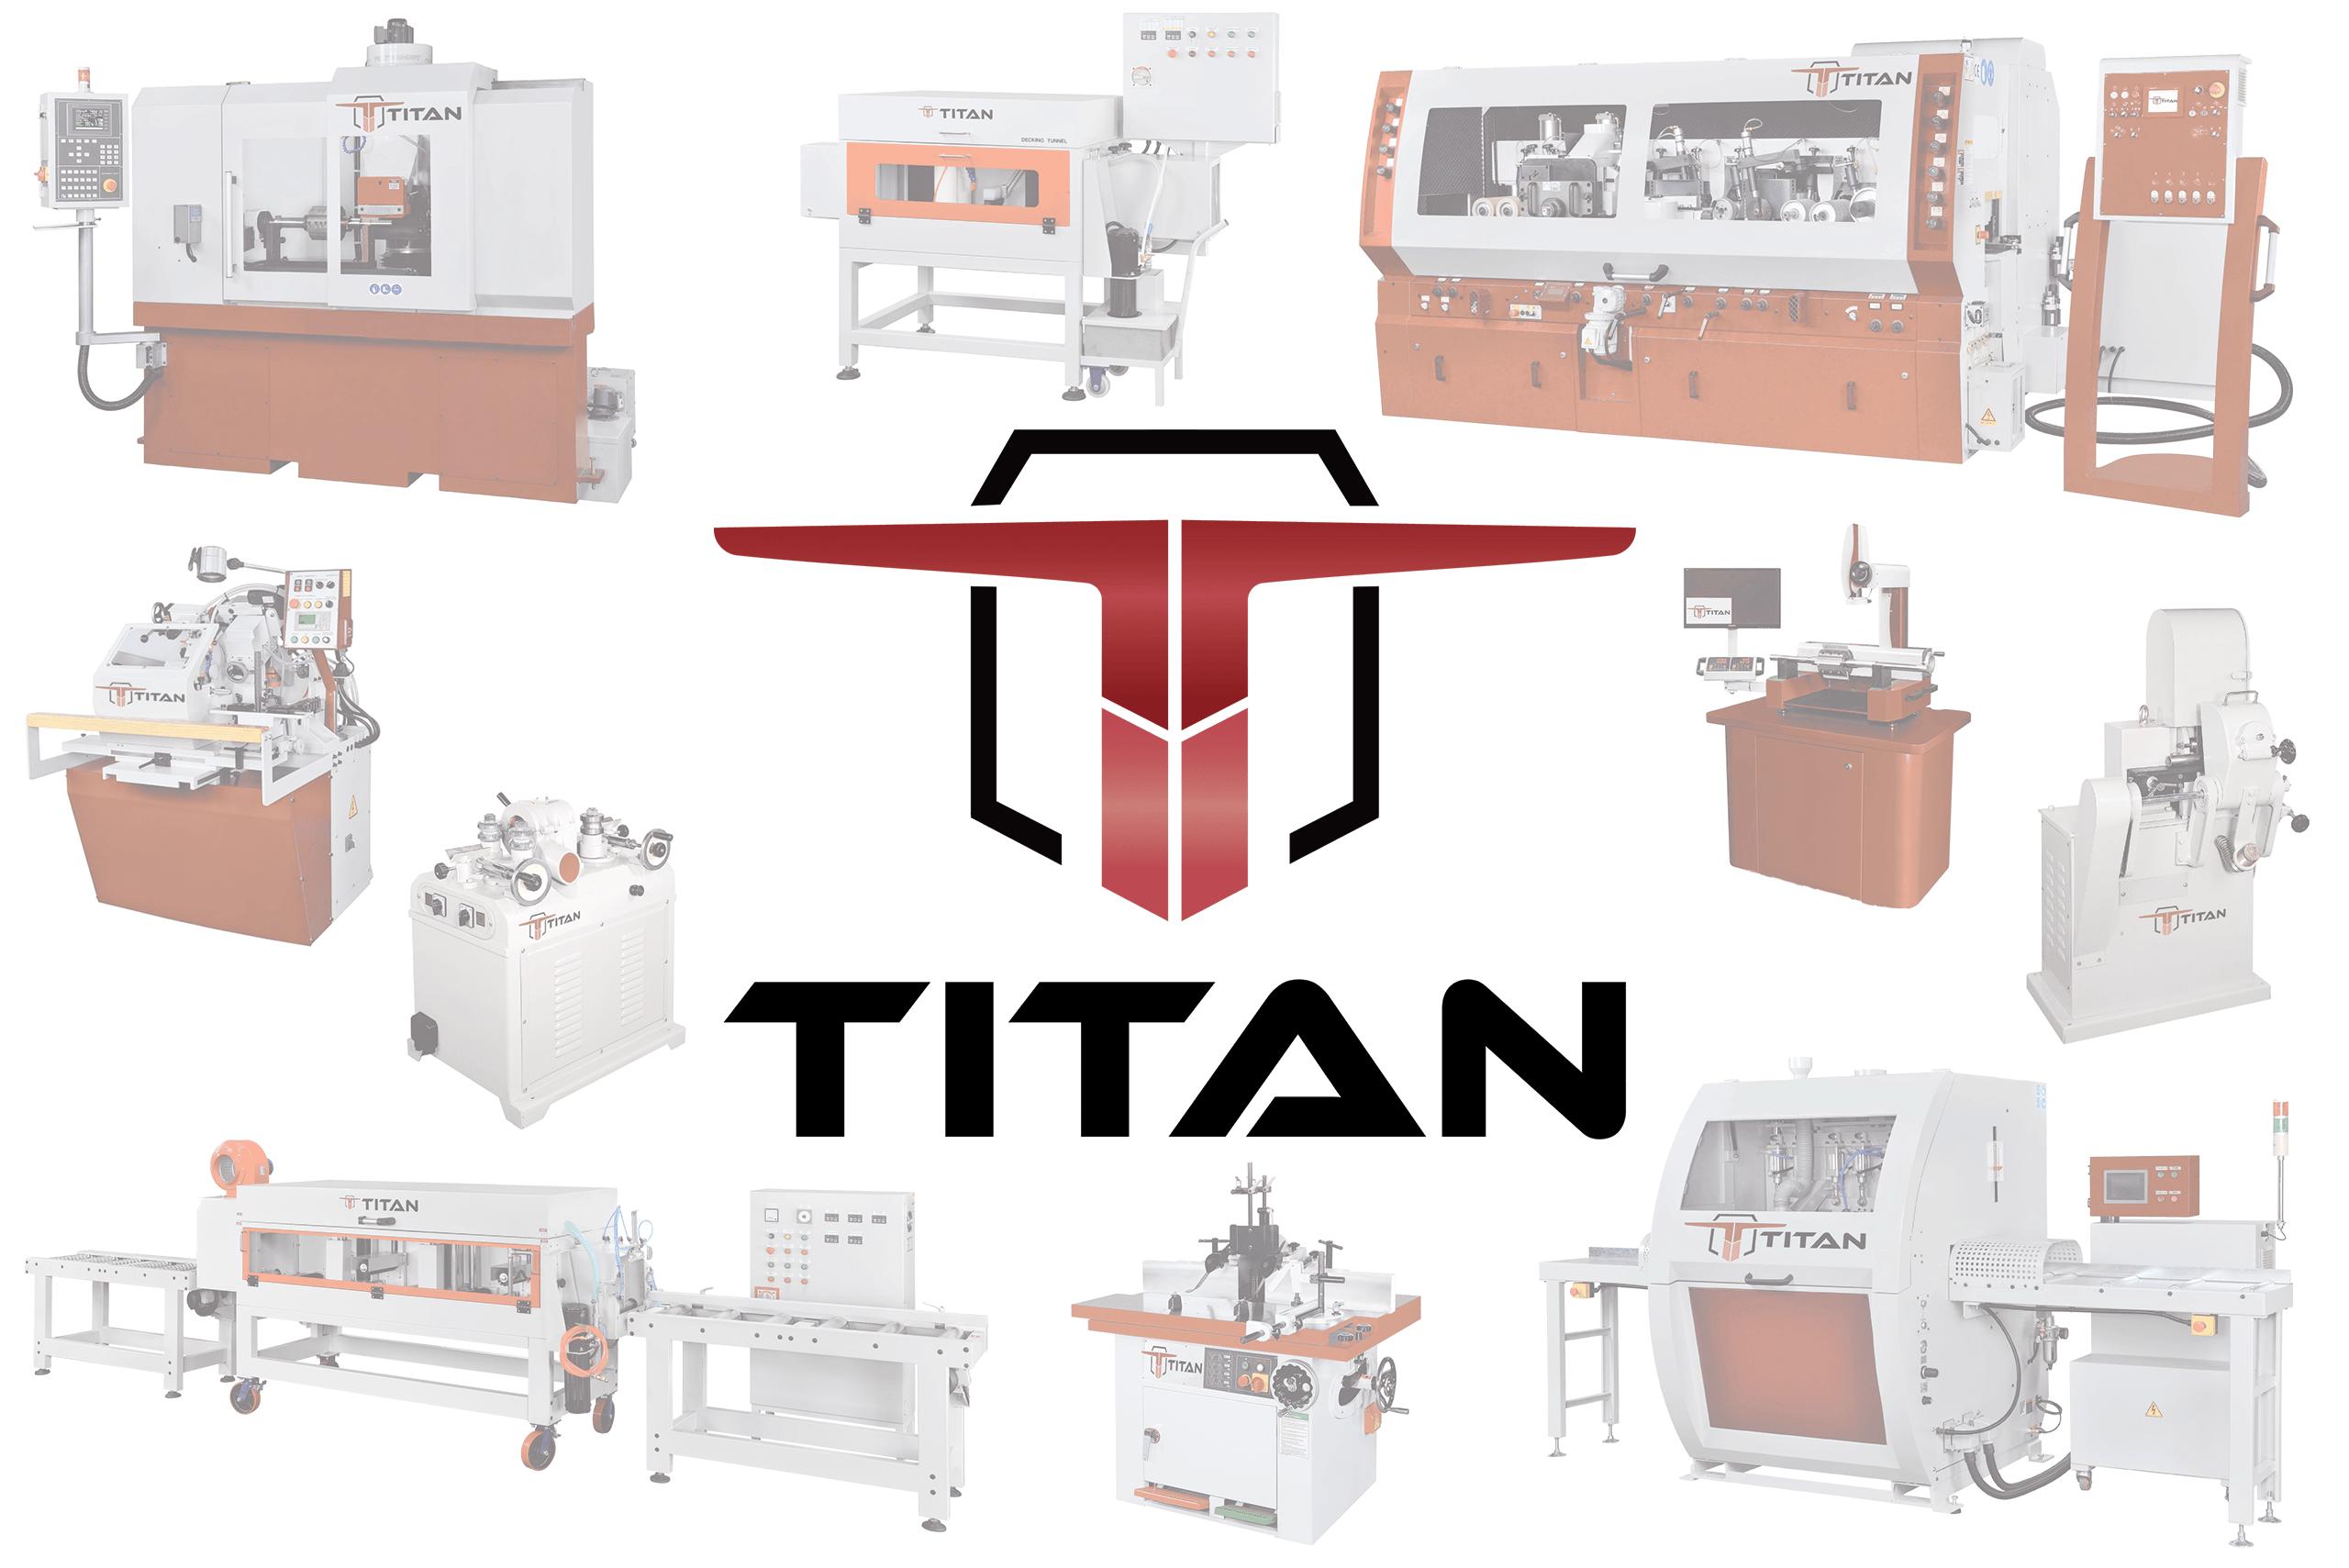 Titan Woodworking Machinery